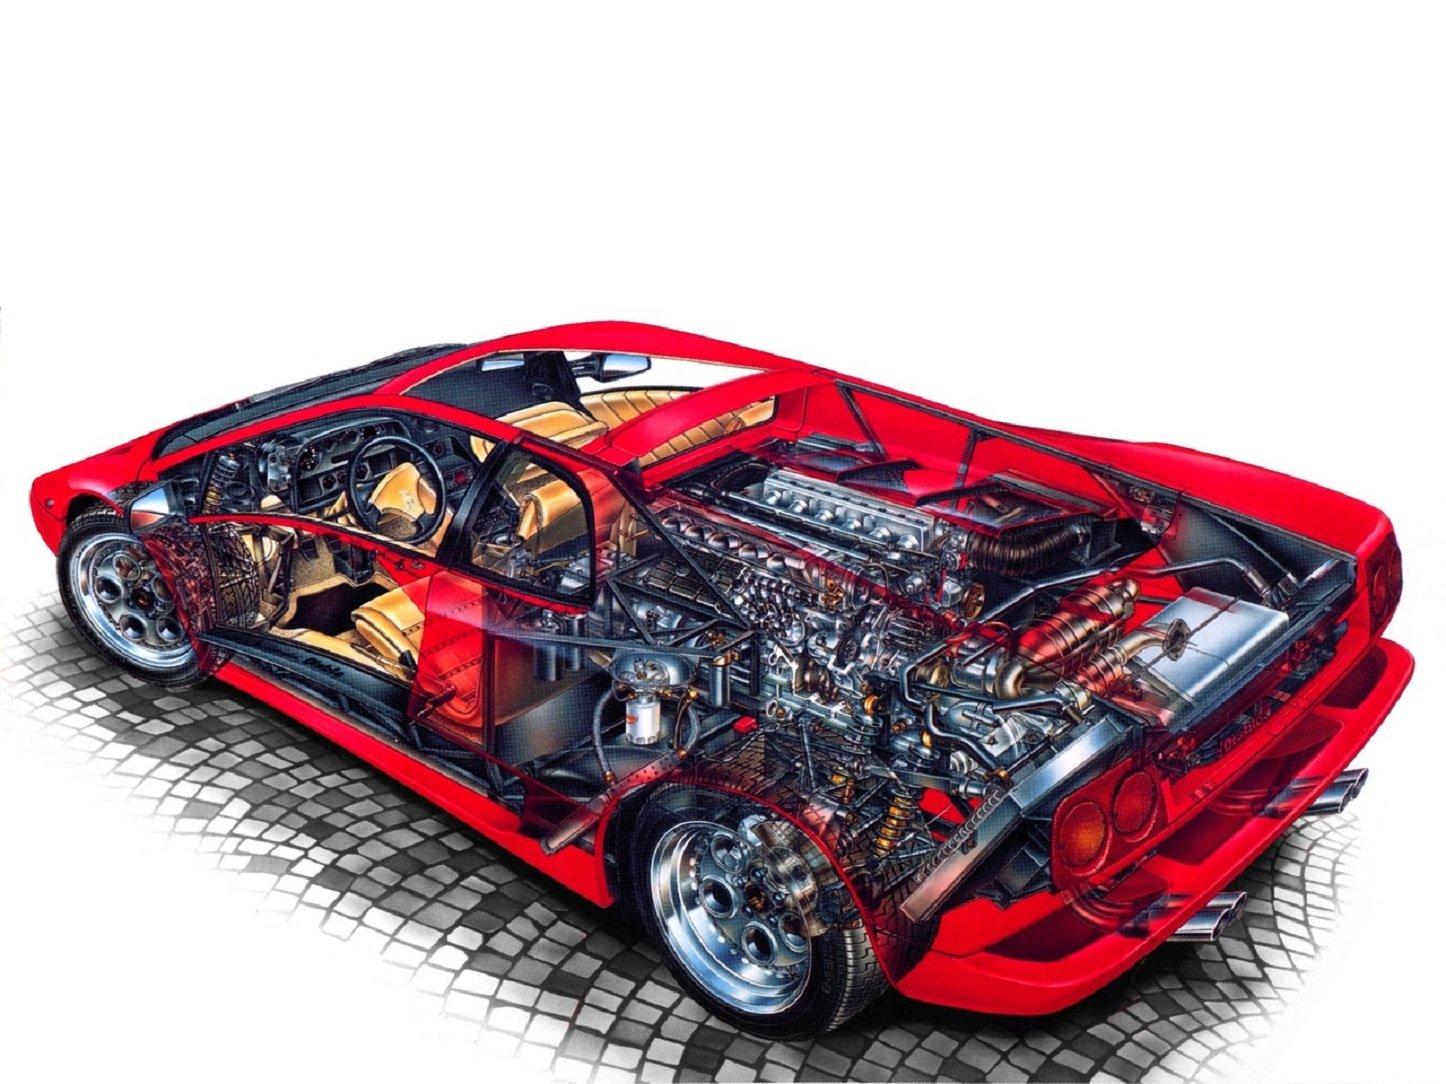 Lamborghini Diablo 1990 Cars Supercars Technical Cars